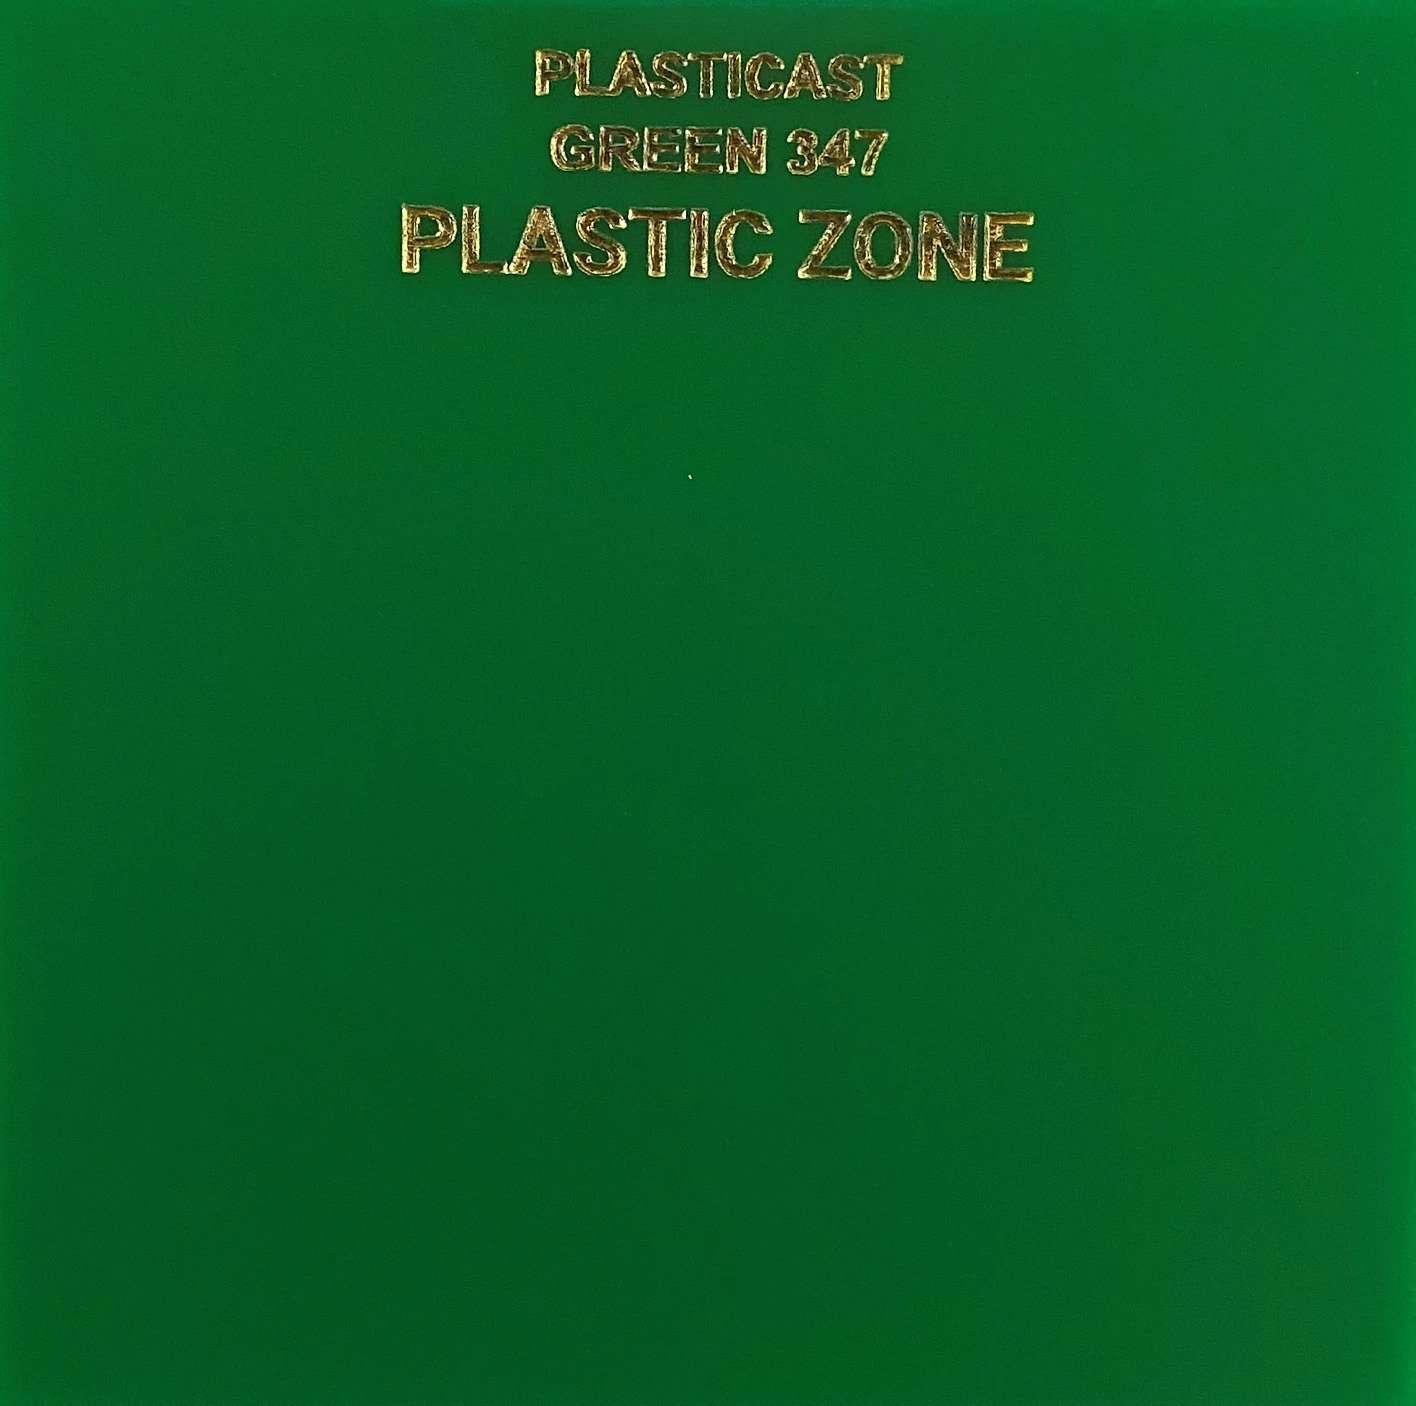 Green 347 acrylic sheet